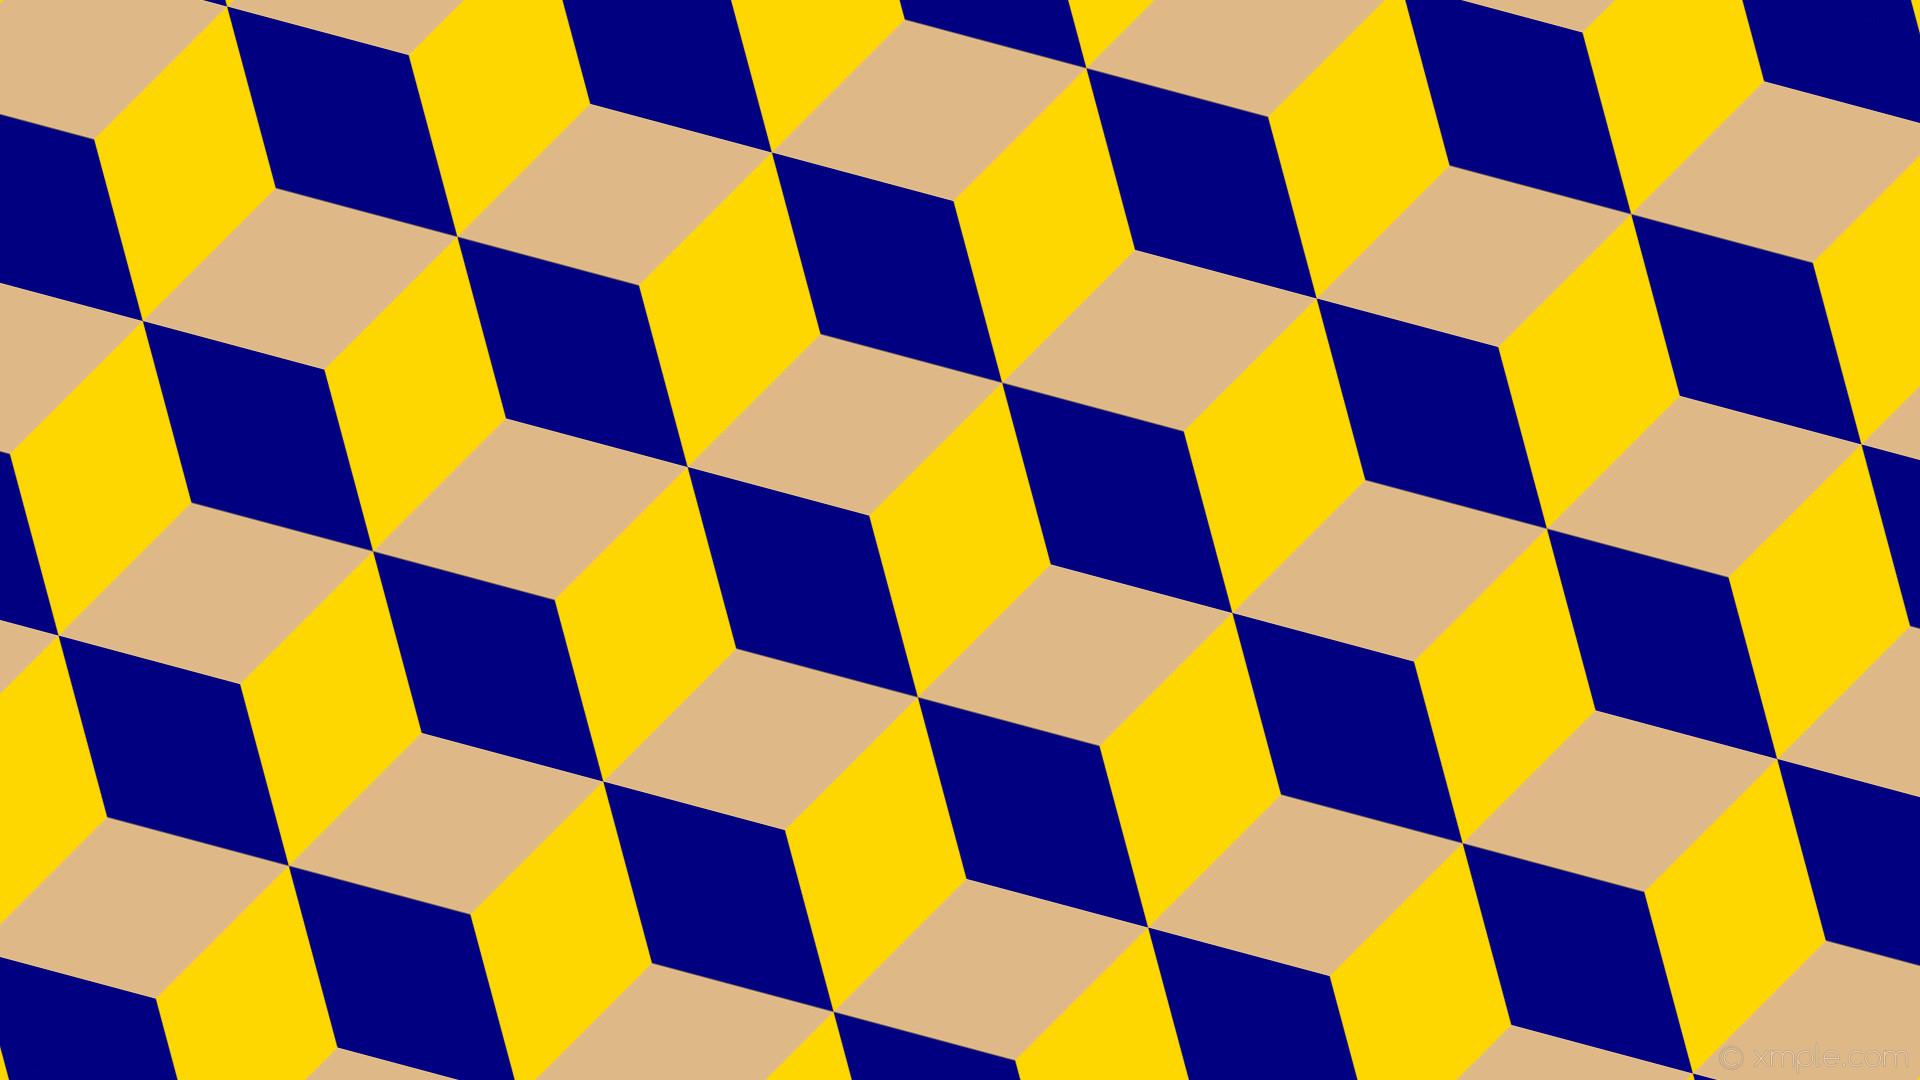 wallpaper 3d cubes yellow brown blue gold burly wood navy #ffd700 #deb887  #000080